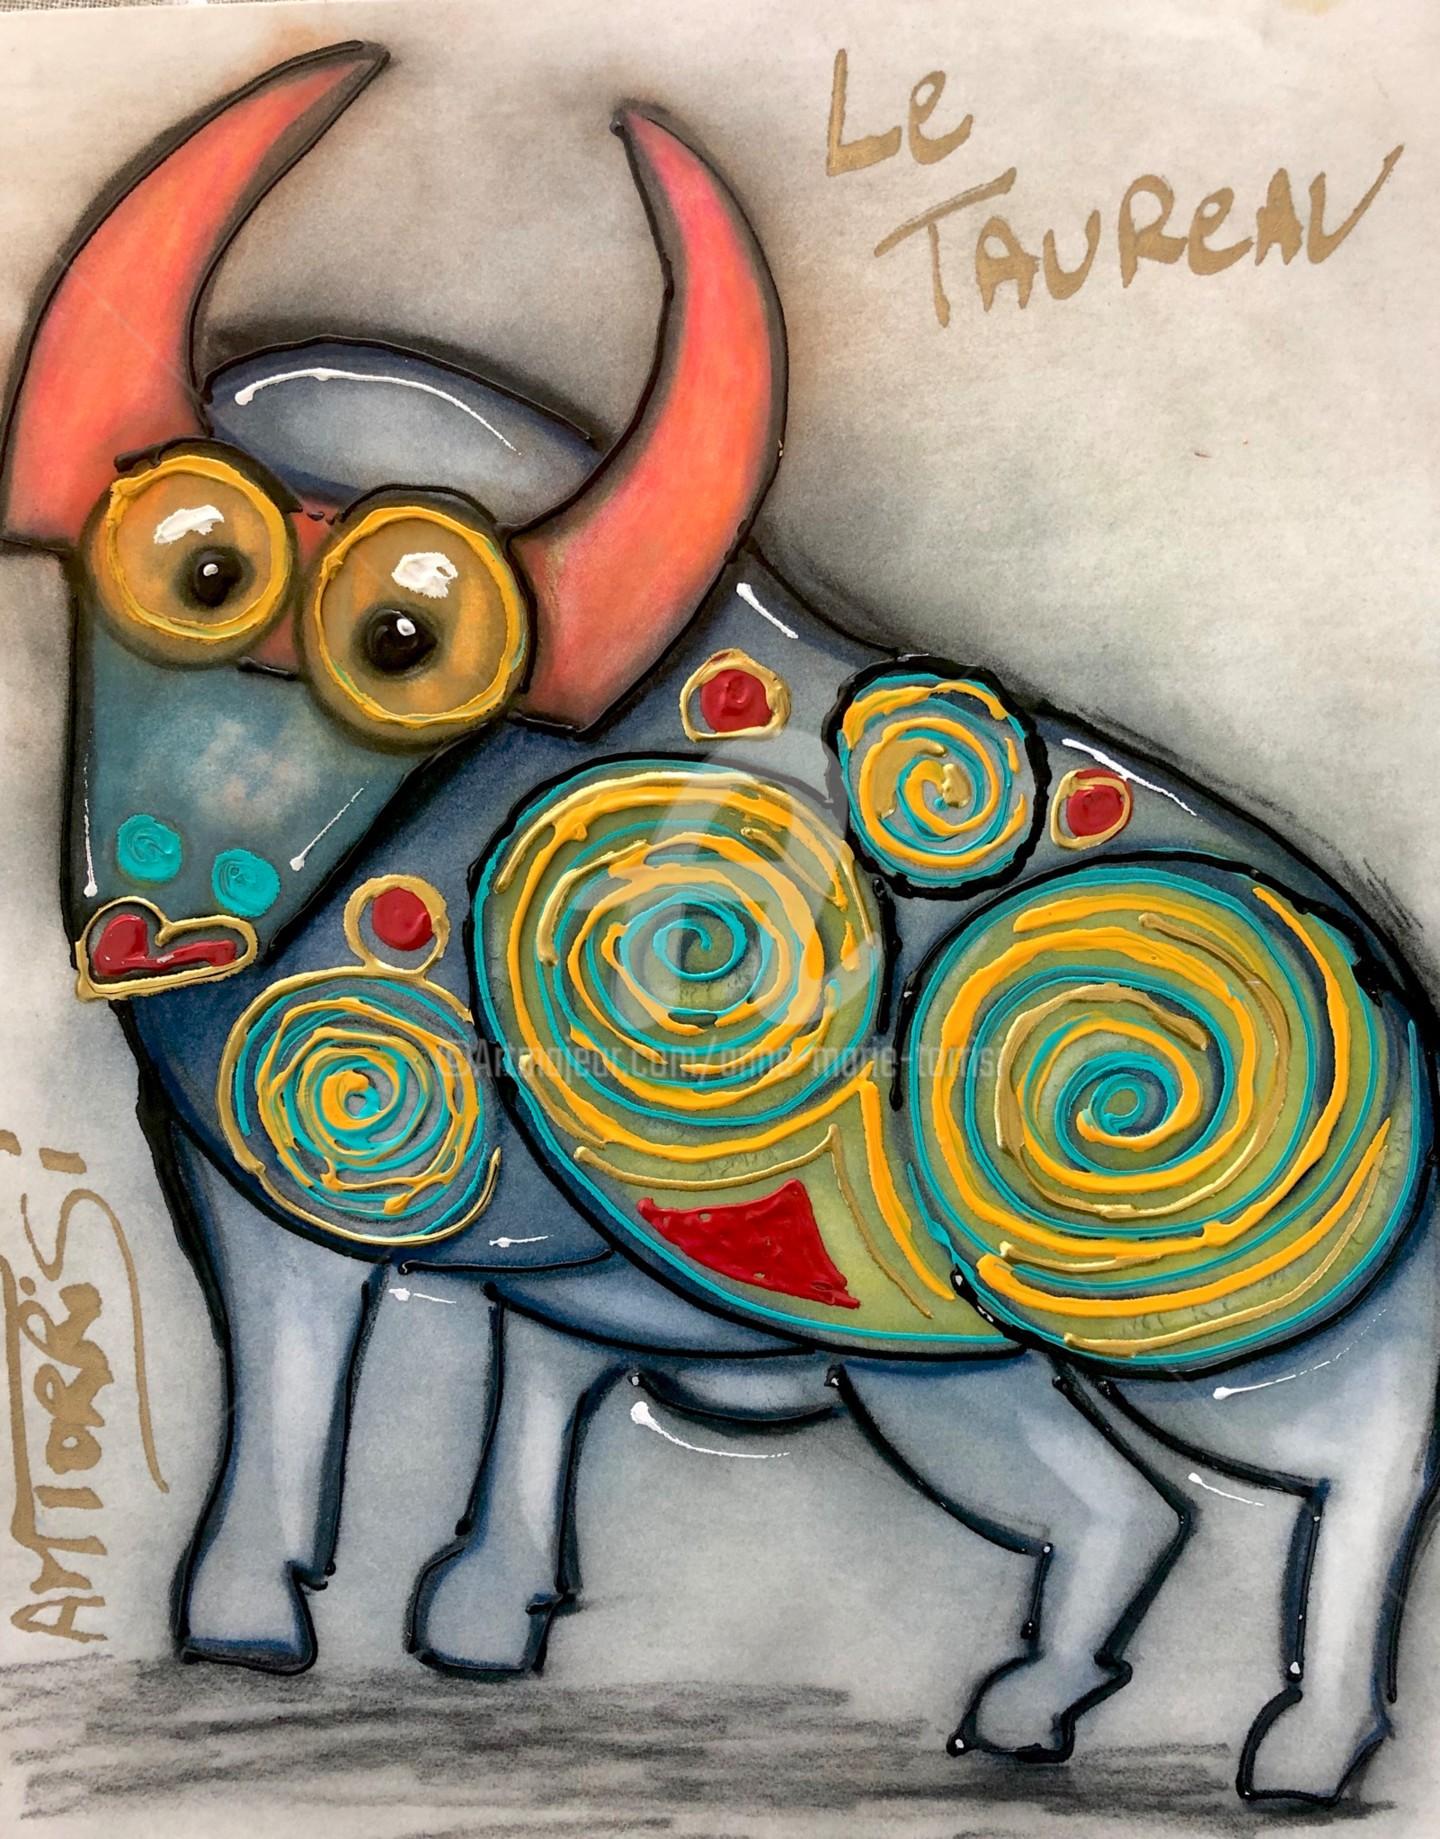 Anne Marie Torrisi - LE TAUREAU pastel